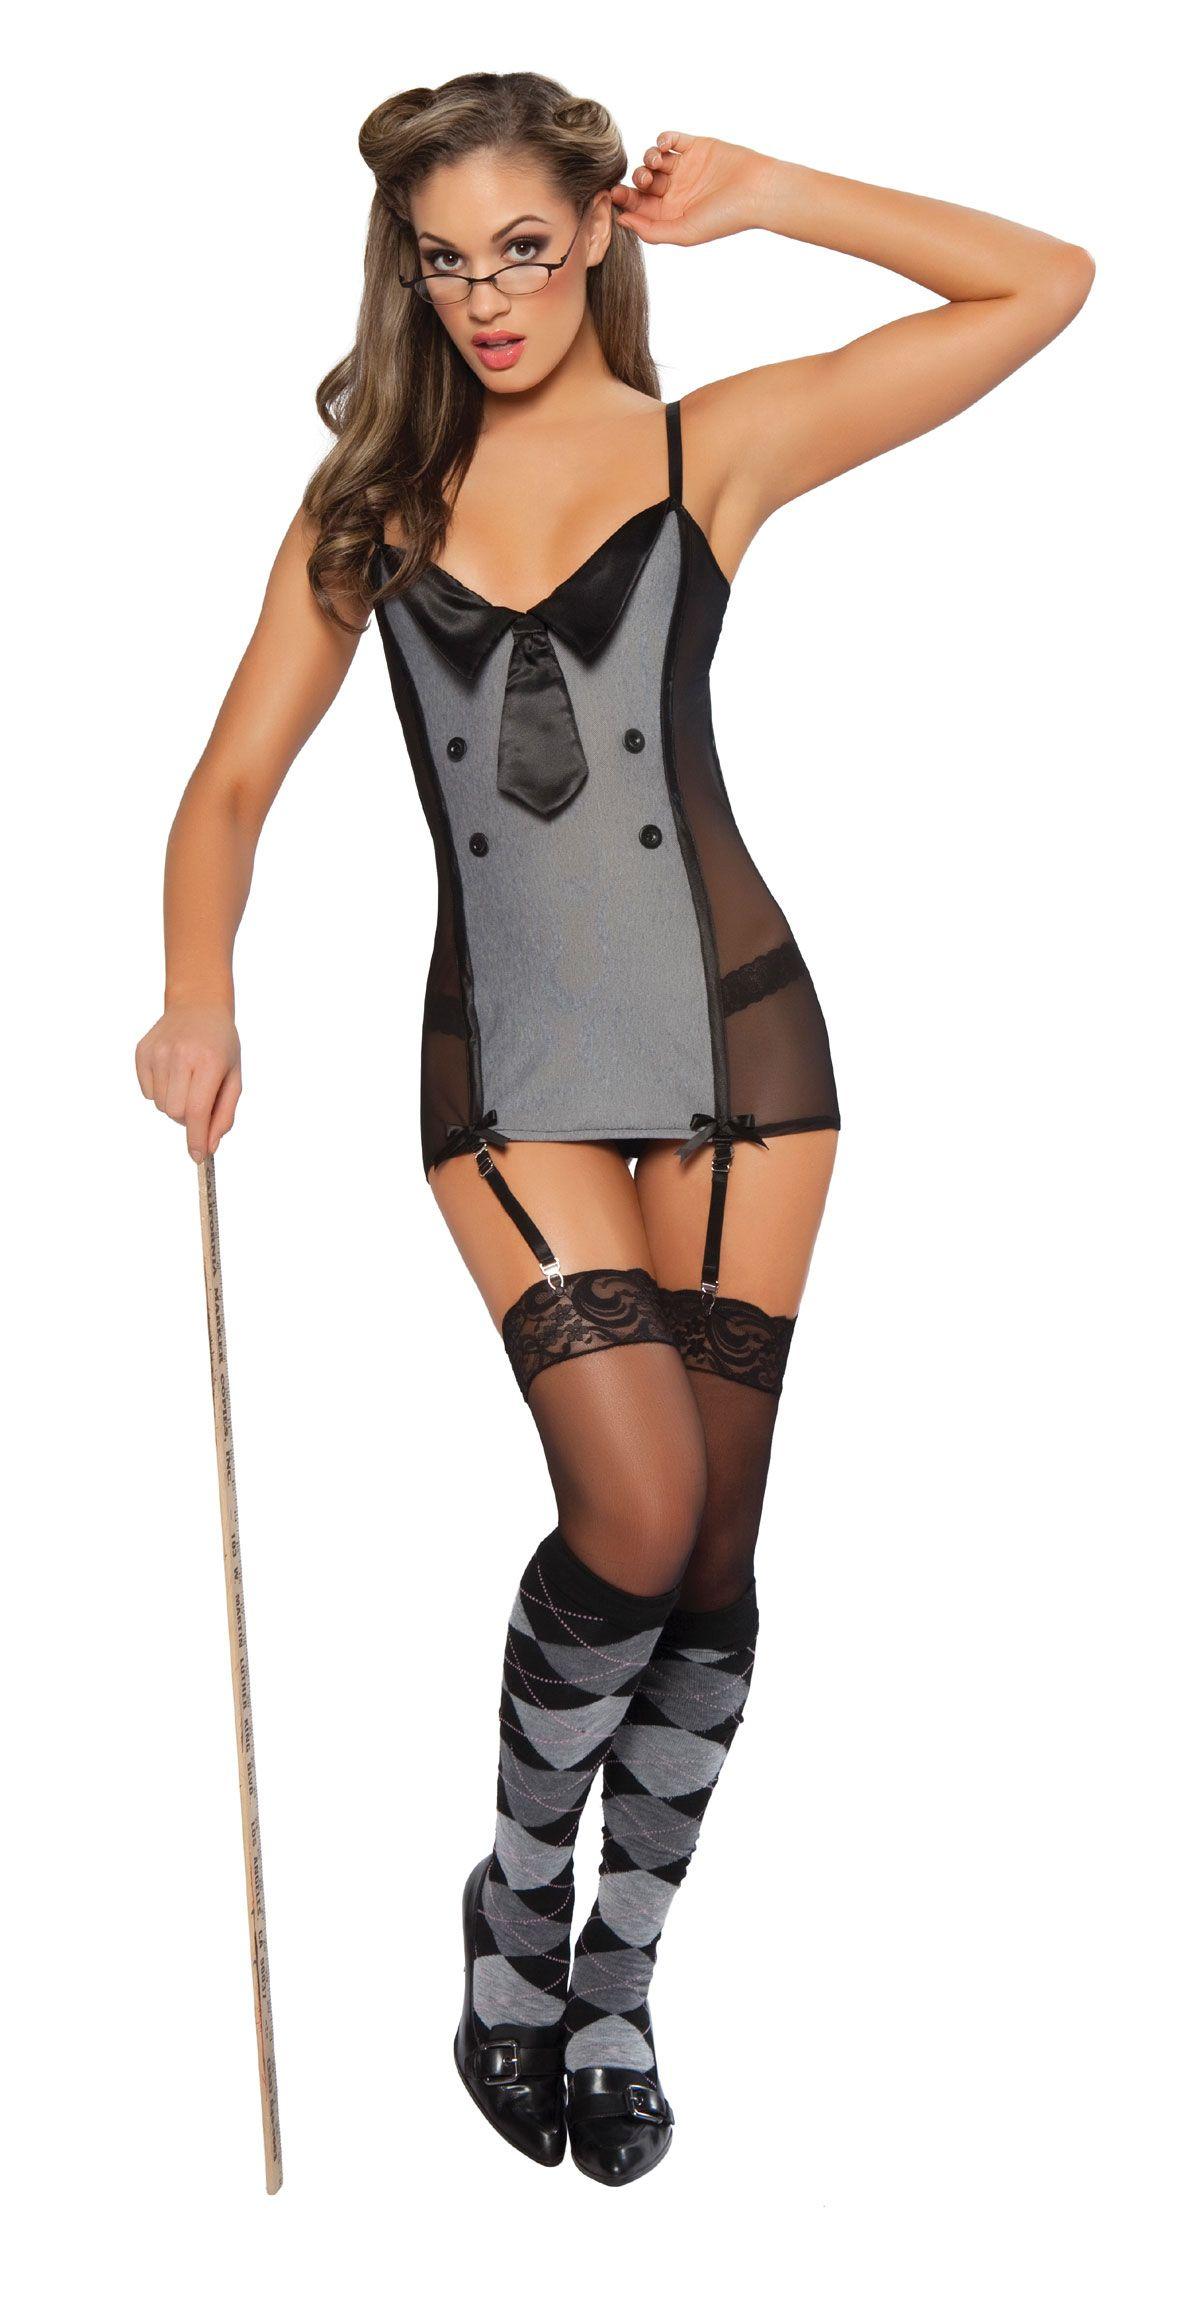 girls Nude costume